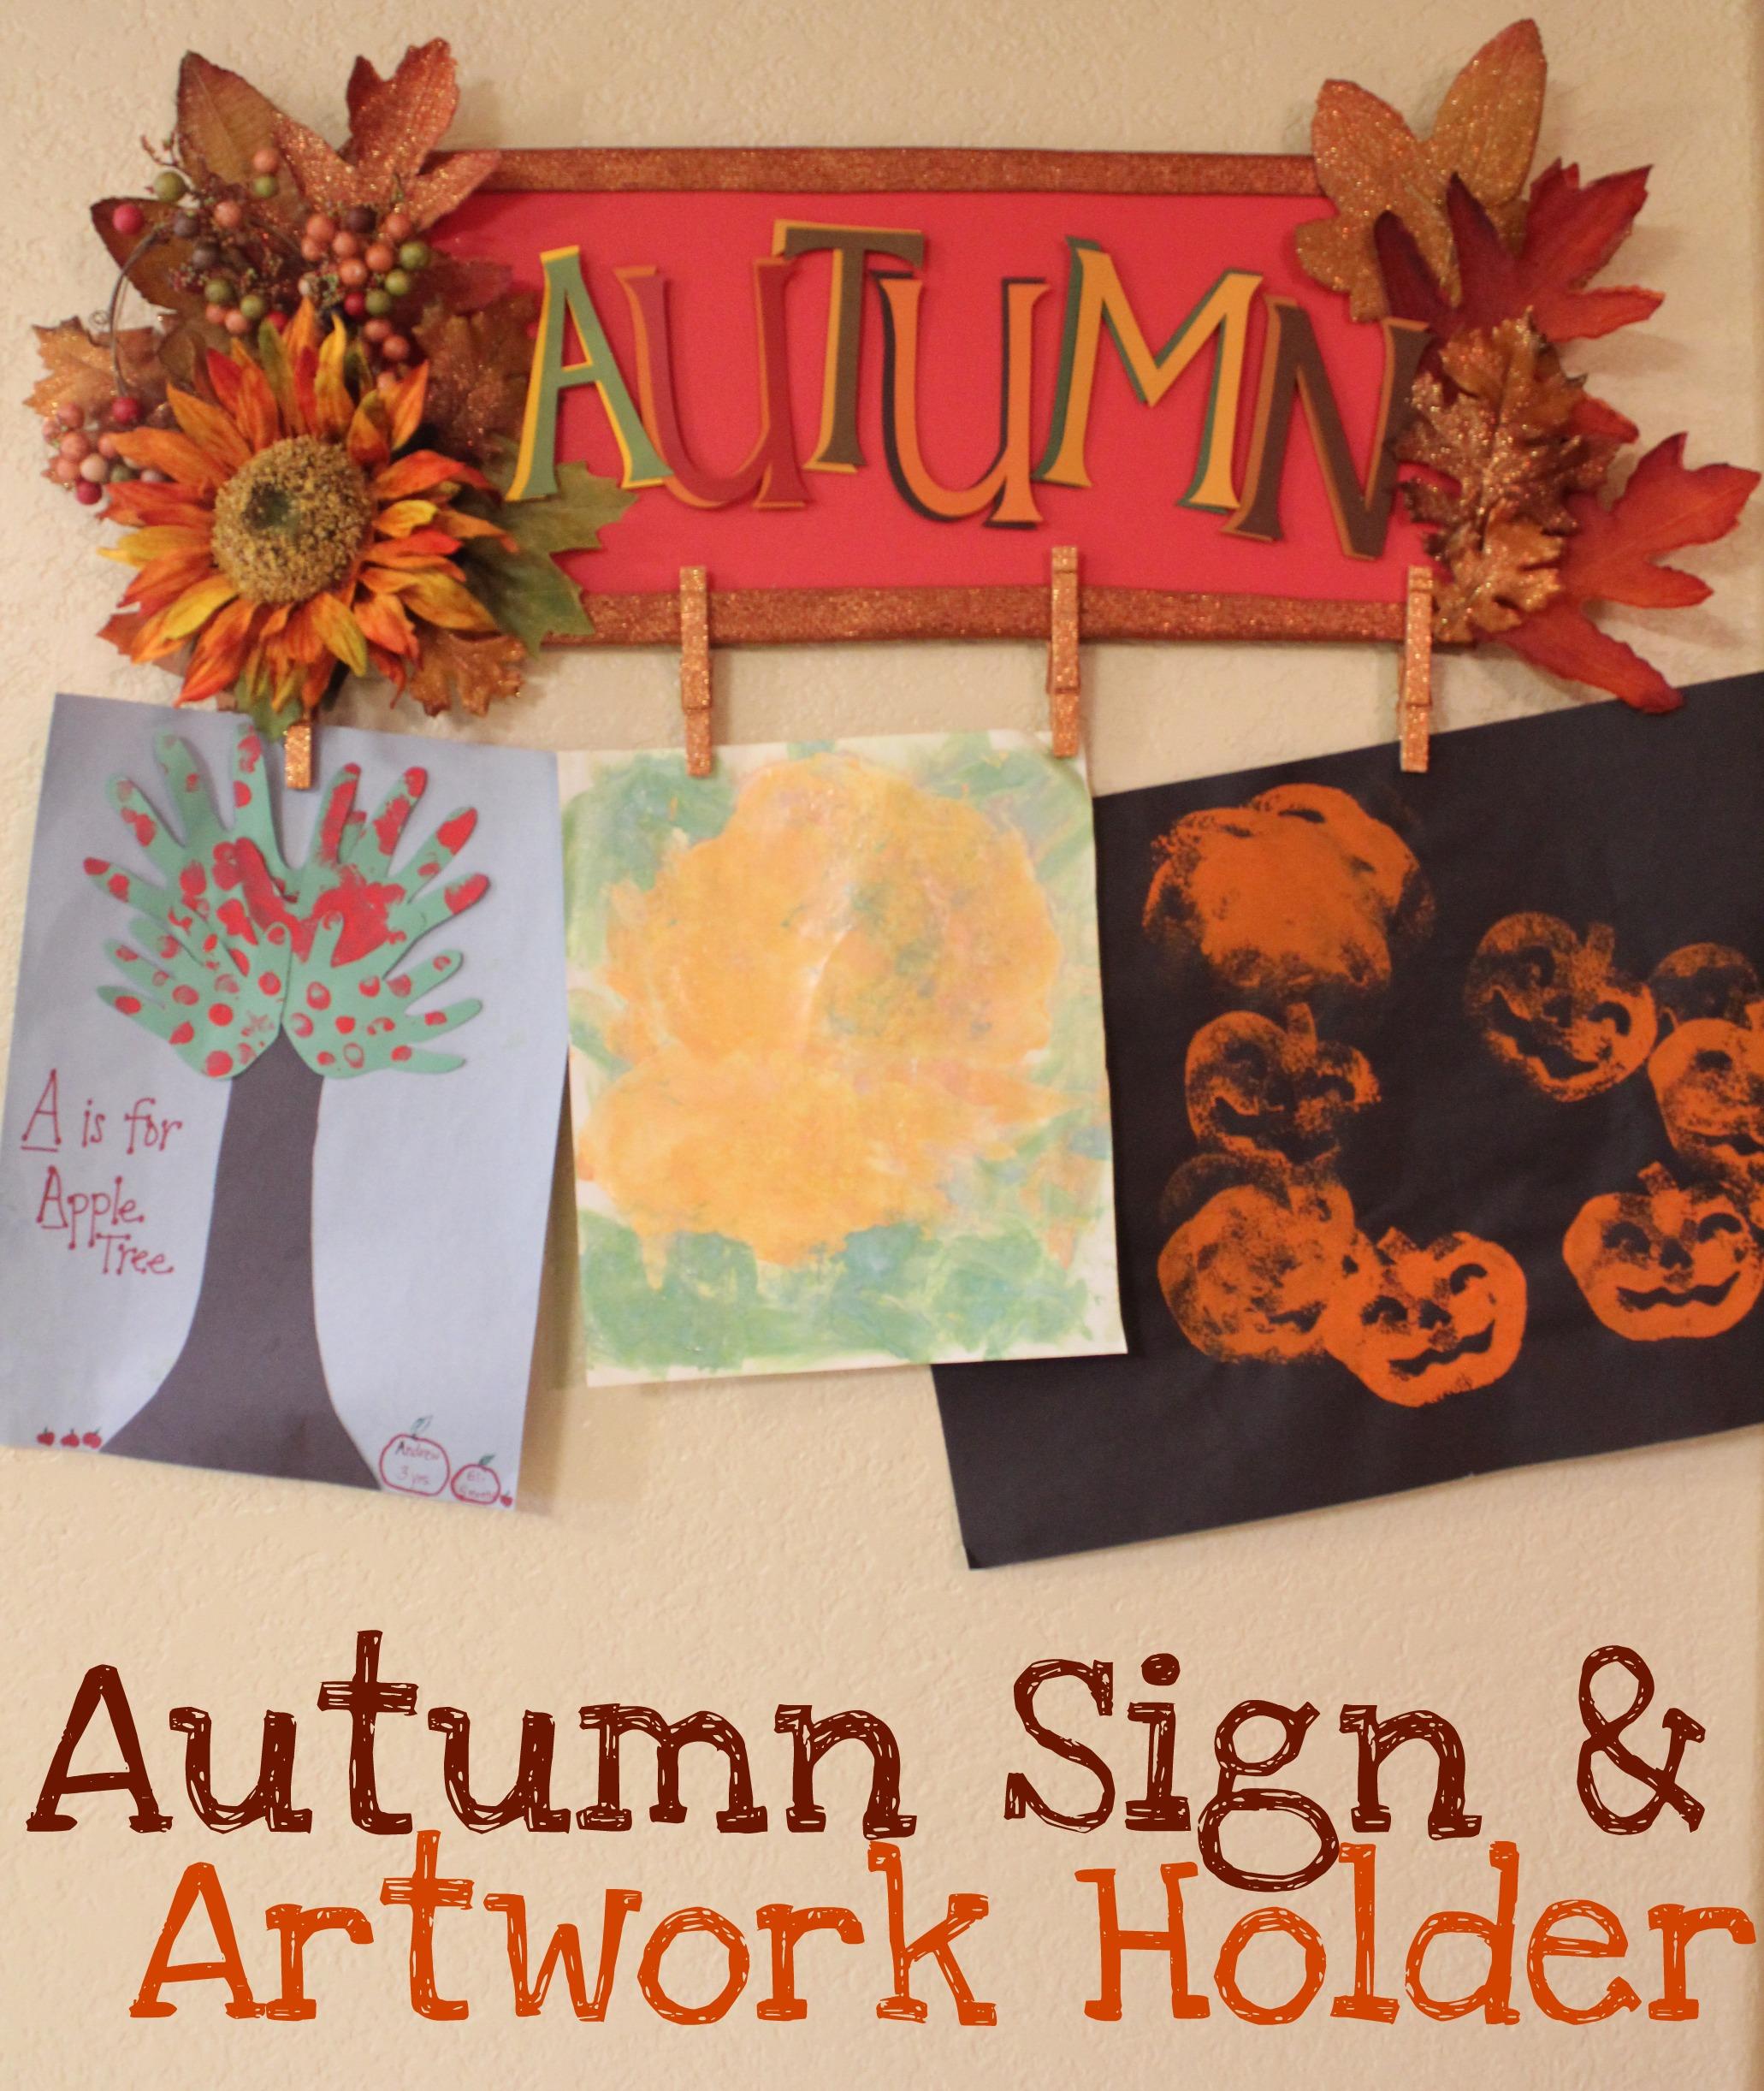 Autumn Sign & Artwork Holder